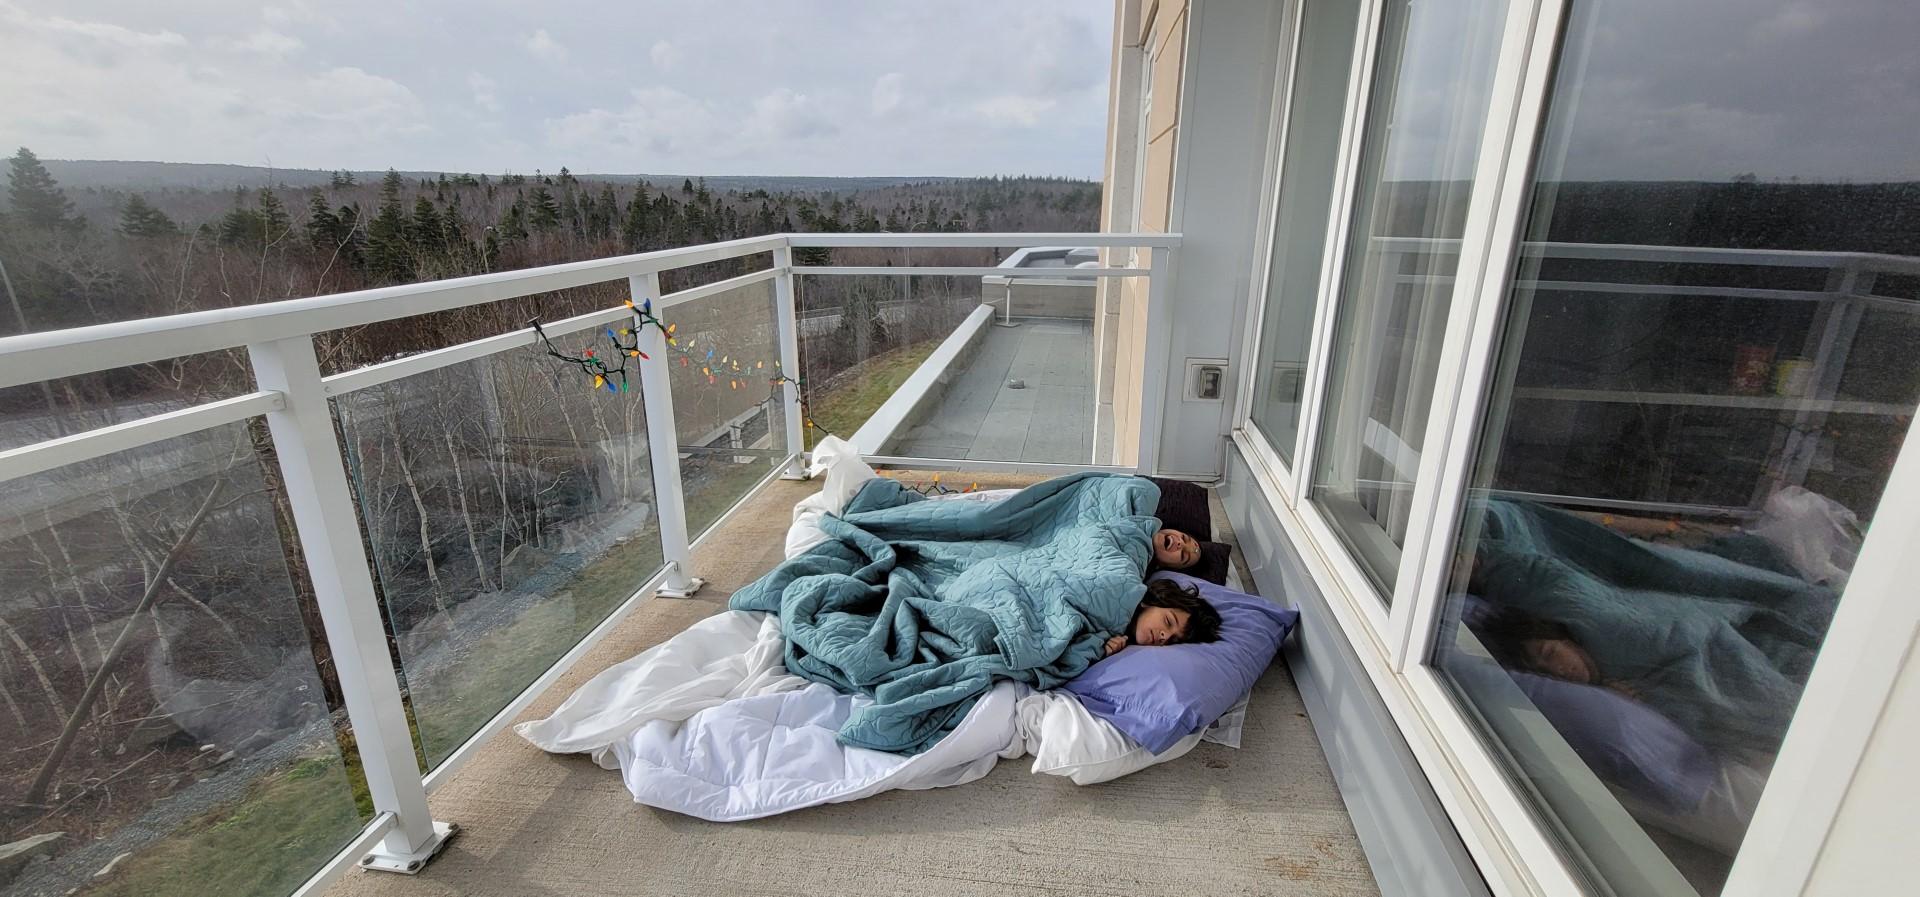 kids on balcony in Halifax winter